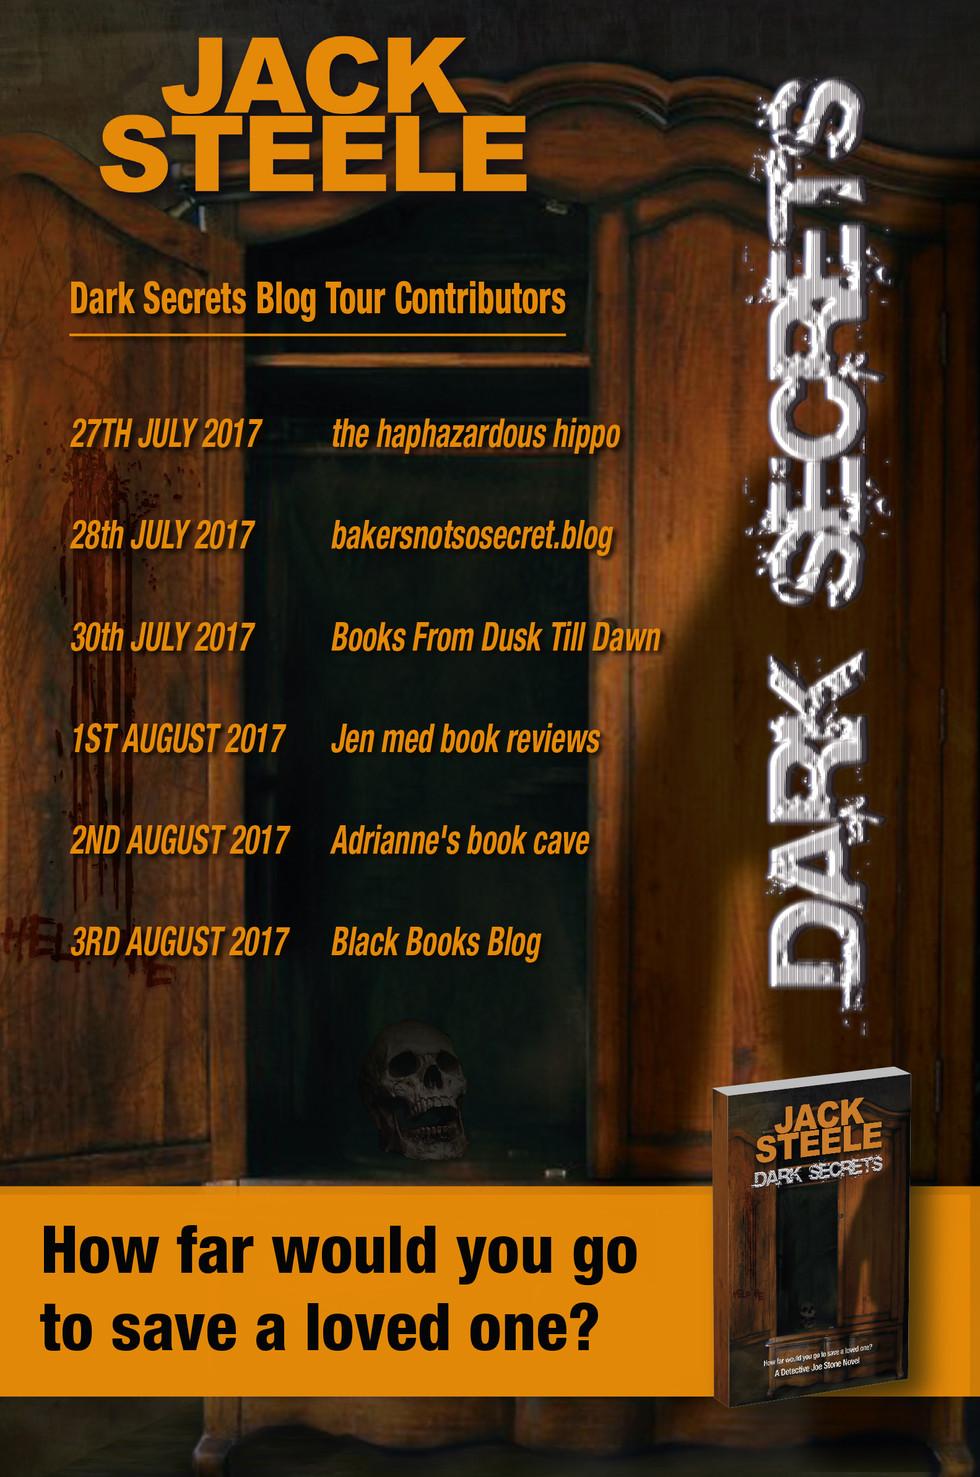 Dark Secrets Blog Tour